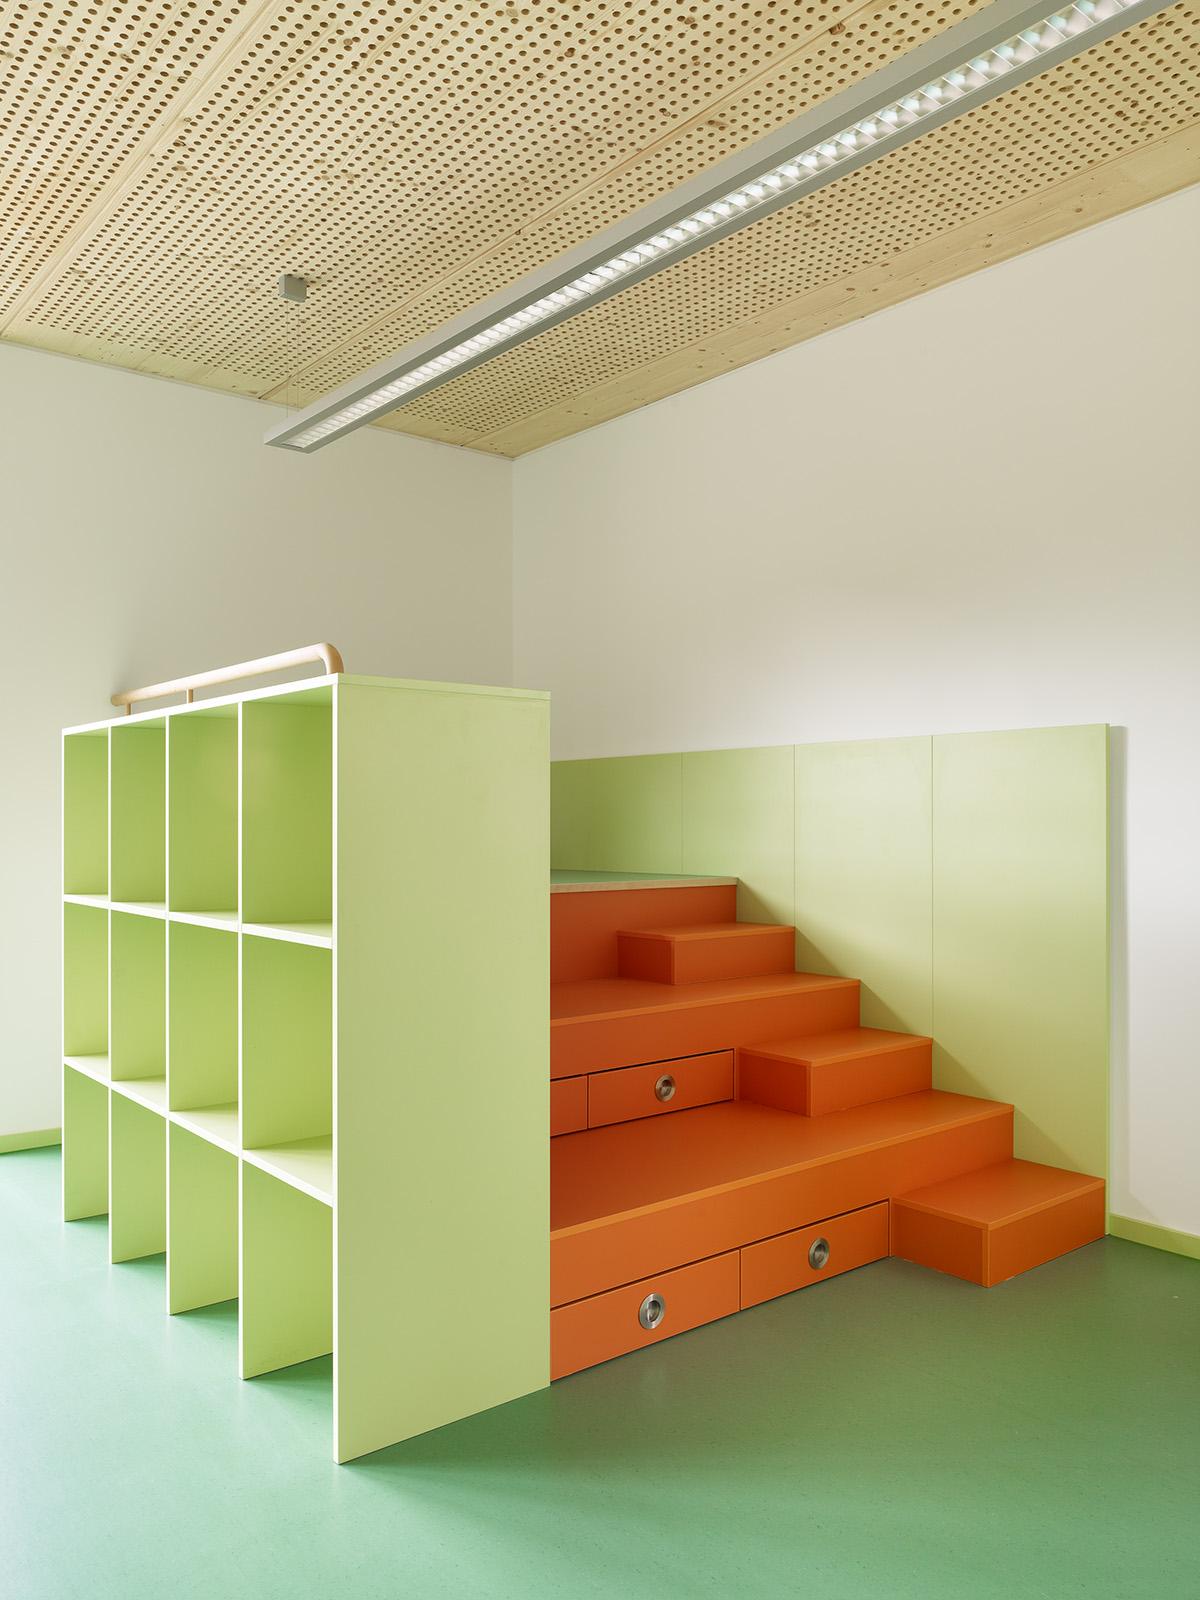 kita siekids villa pusteblume g.-braun-straße 16 76187 karlsruhe  architektur klinkott architekten yorckstraße 43 76185 karlsruhe www.klinkott-architekten.de